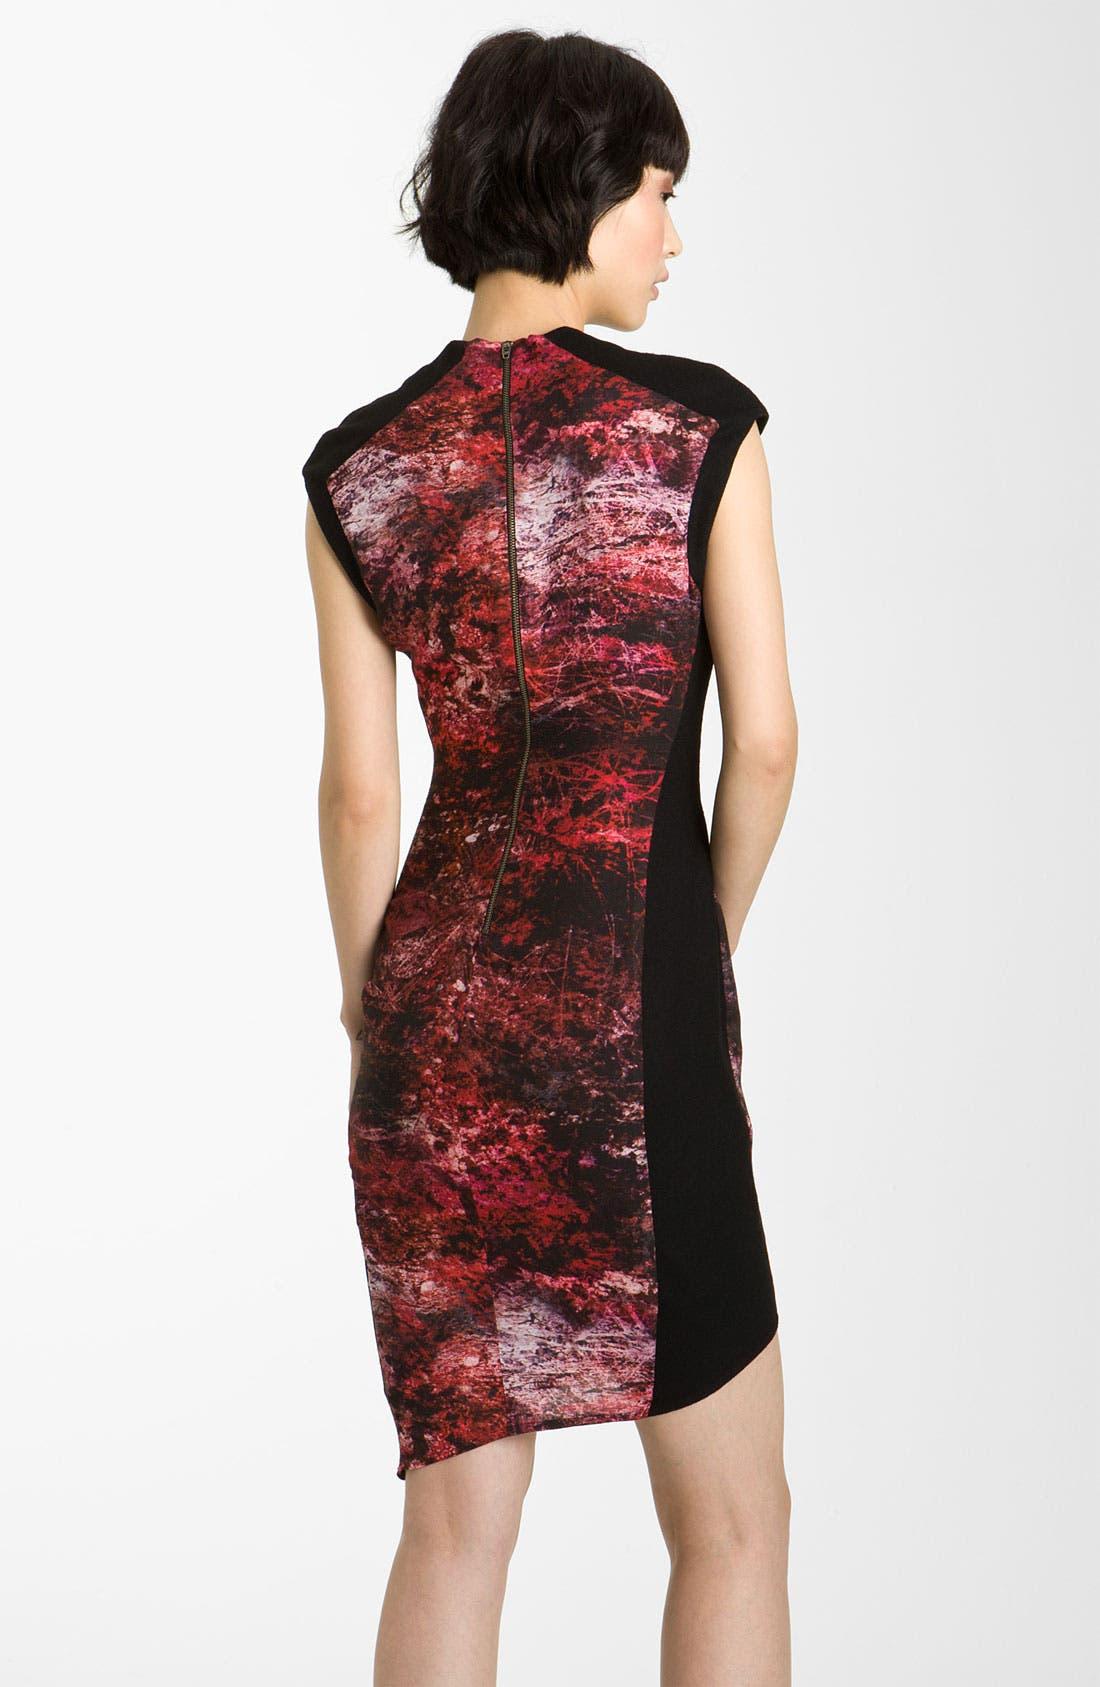 HELMUT LANG,                             'Midnight Floral' Print Twill Dress,                             Alternate thumbnail 2, color,                             640